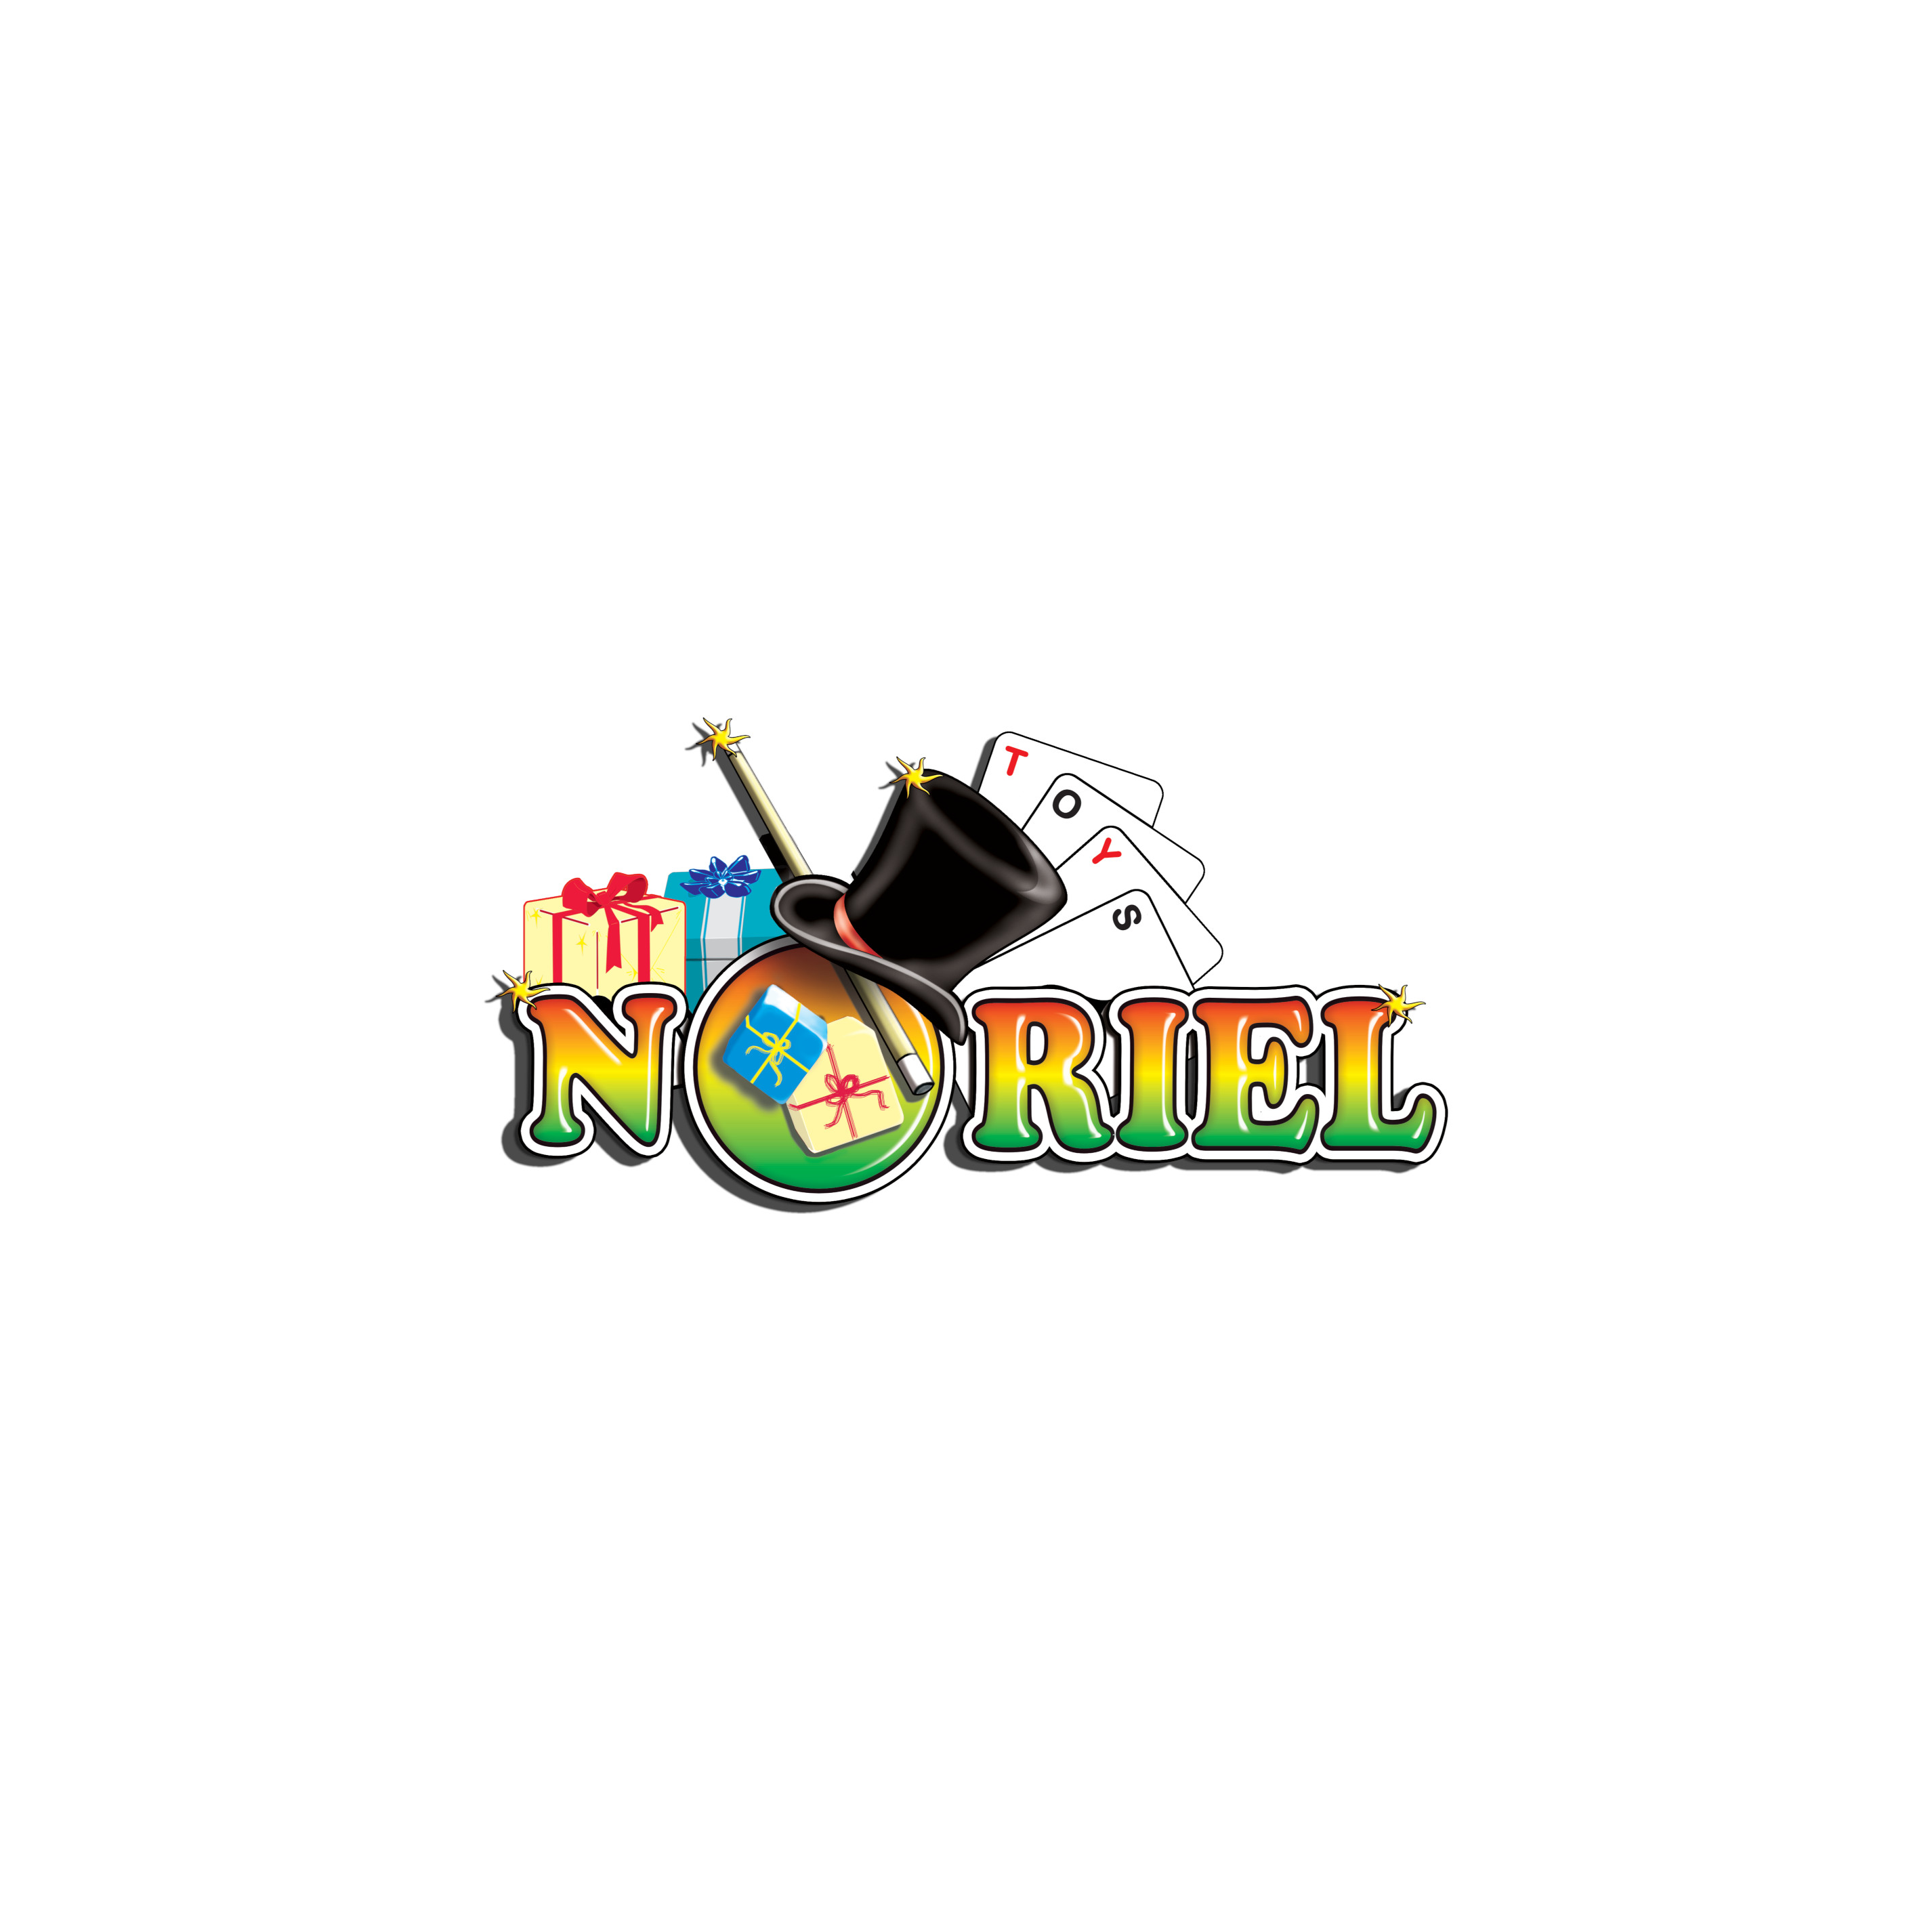 3750_3752_001 - Figurina interactiva lenes WowWee Fingerlings Marge - Mov1